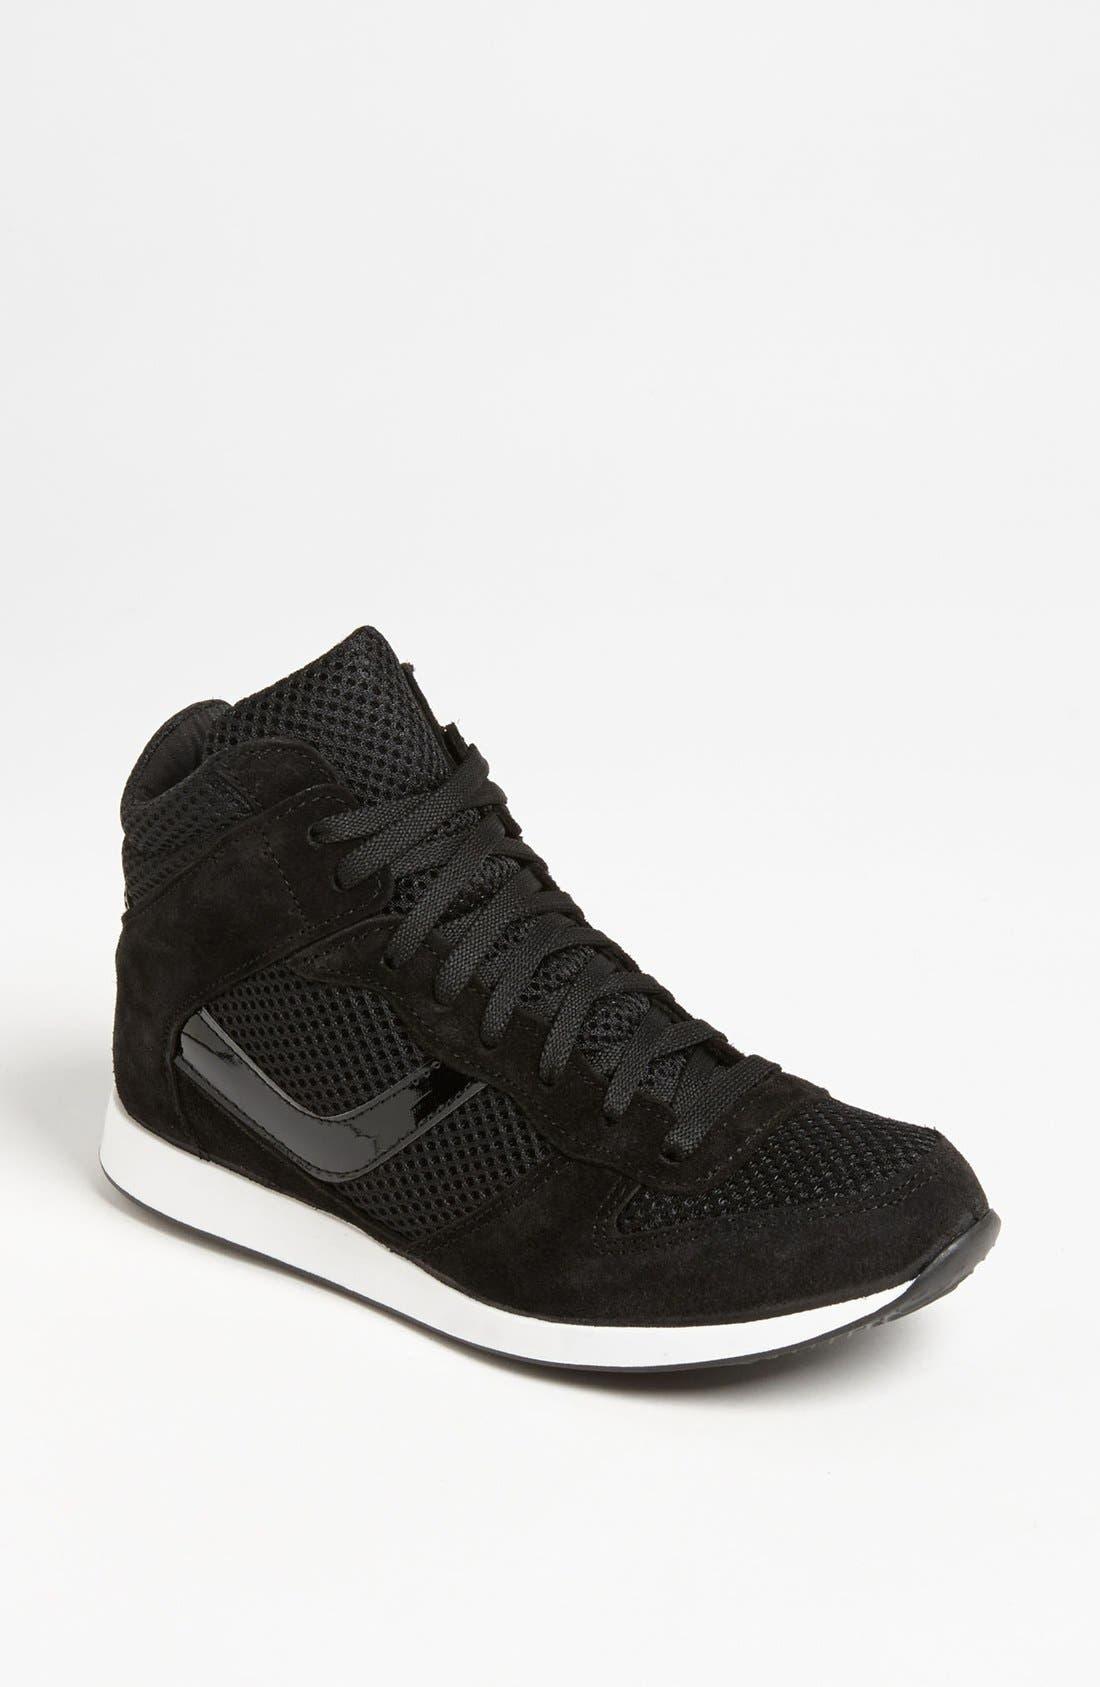 Alternate Image 1 Selected - Topshop 'Twirl' Sneaker